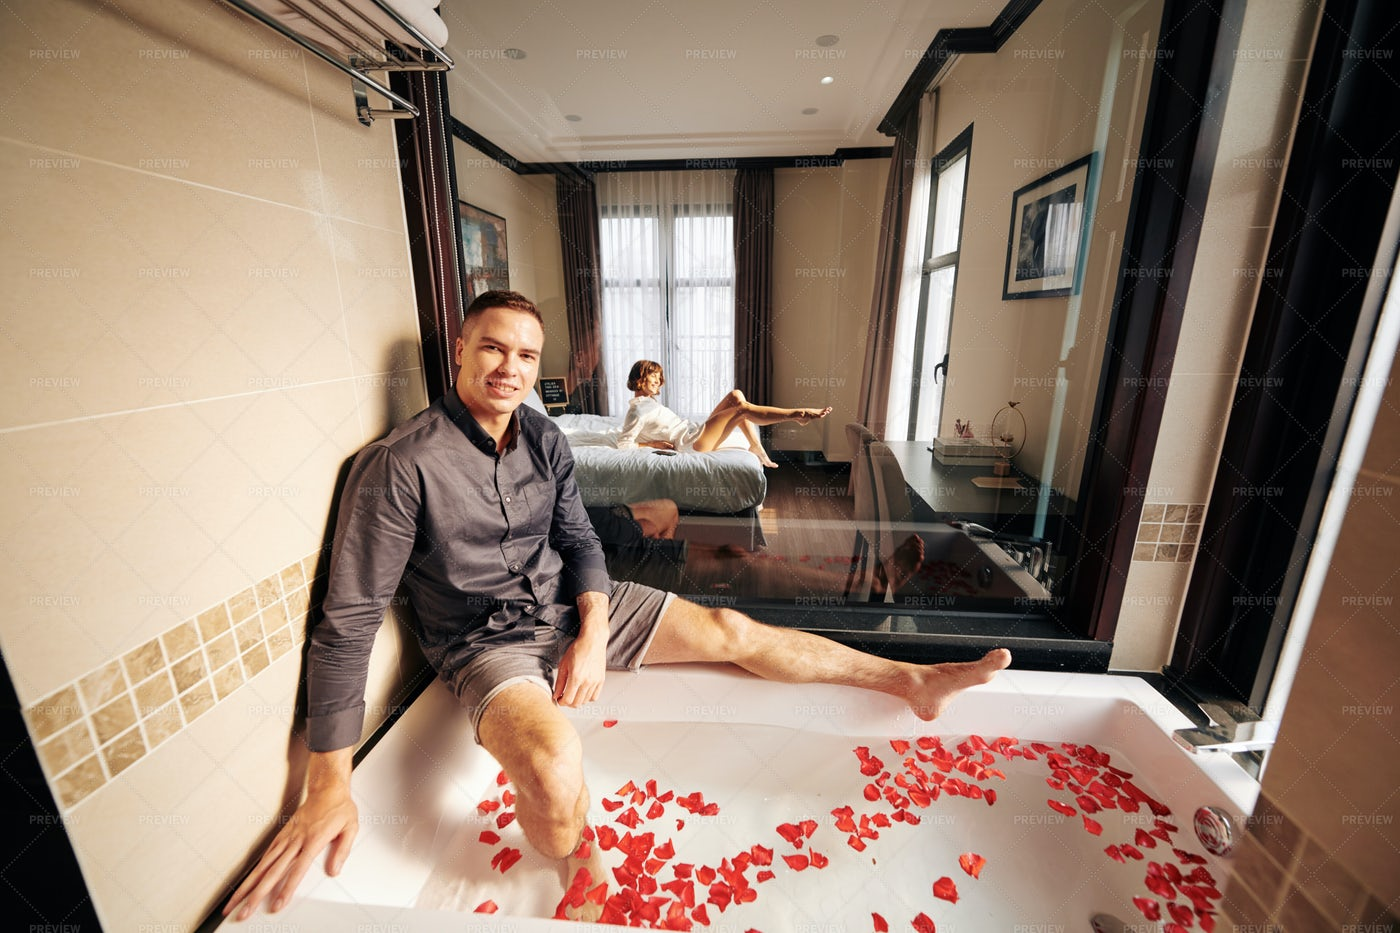 Man Preparing Bath For Him And His: Stock Photos